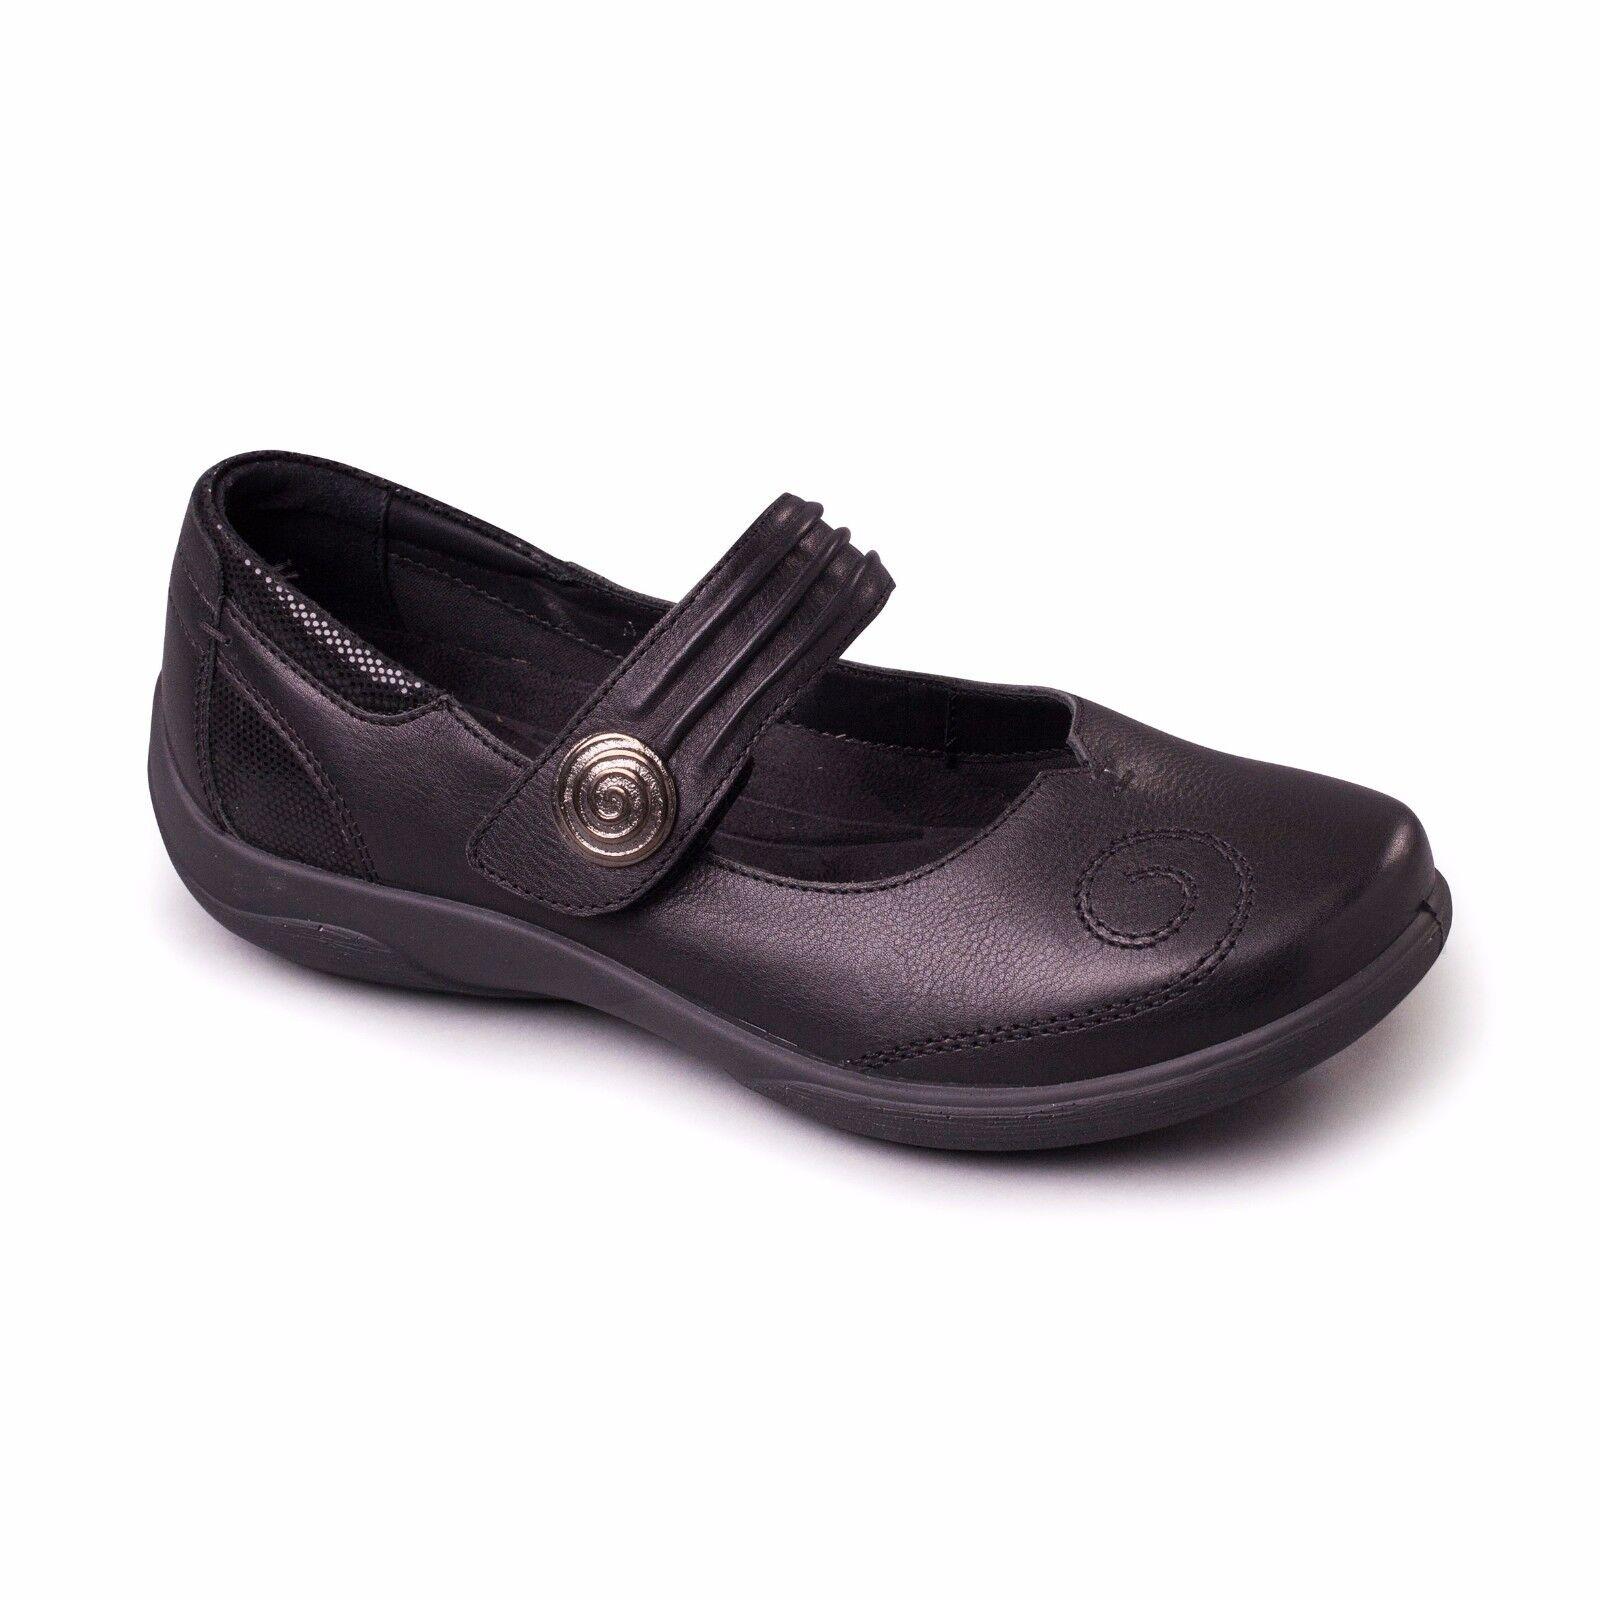 Moda barata y hermosa Descuento por tiempo limitado Padders POEM Ladies Leather EE/EEE Fitting Mary Jane Touch Fasten Shoe Sizes 3-9